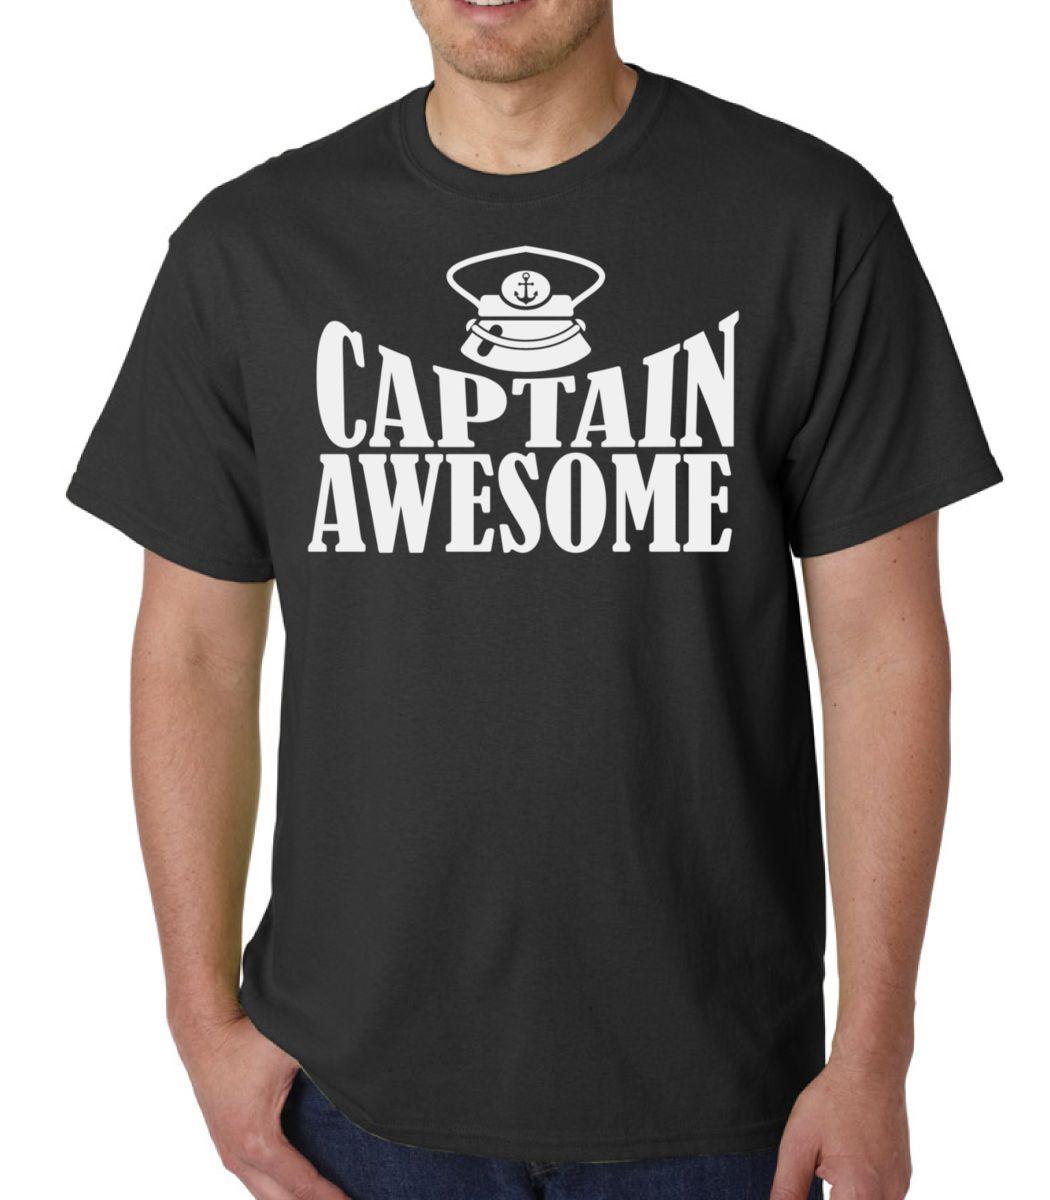 5222fa3565 Captain Awesome Fishing Shirt Funny Slogan Performance Fisherman Present  Gift T Shirt Men'S Premium Short Sleeve Fashion Custom Big Size Men Best Tee  Shirt ...